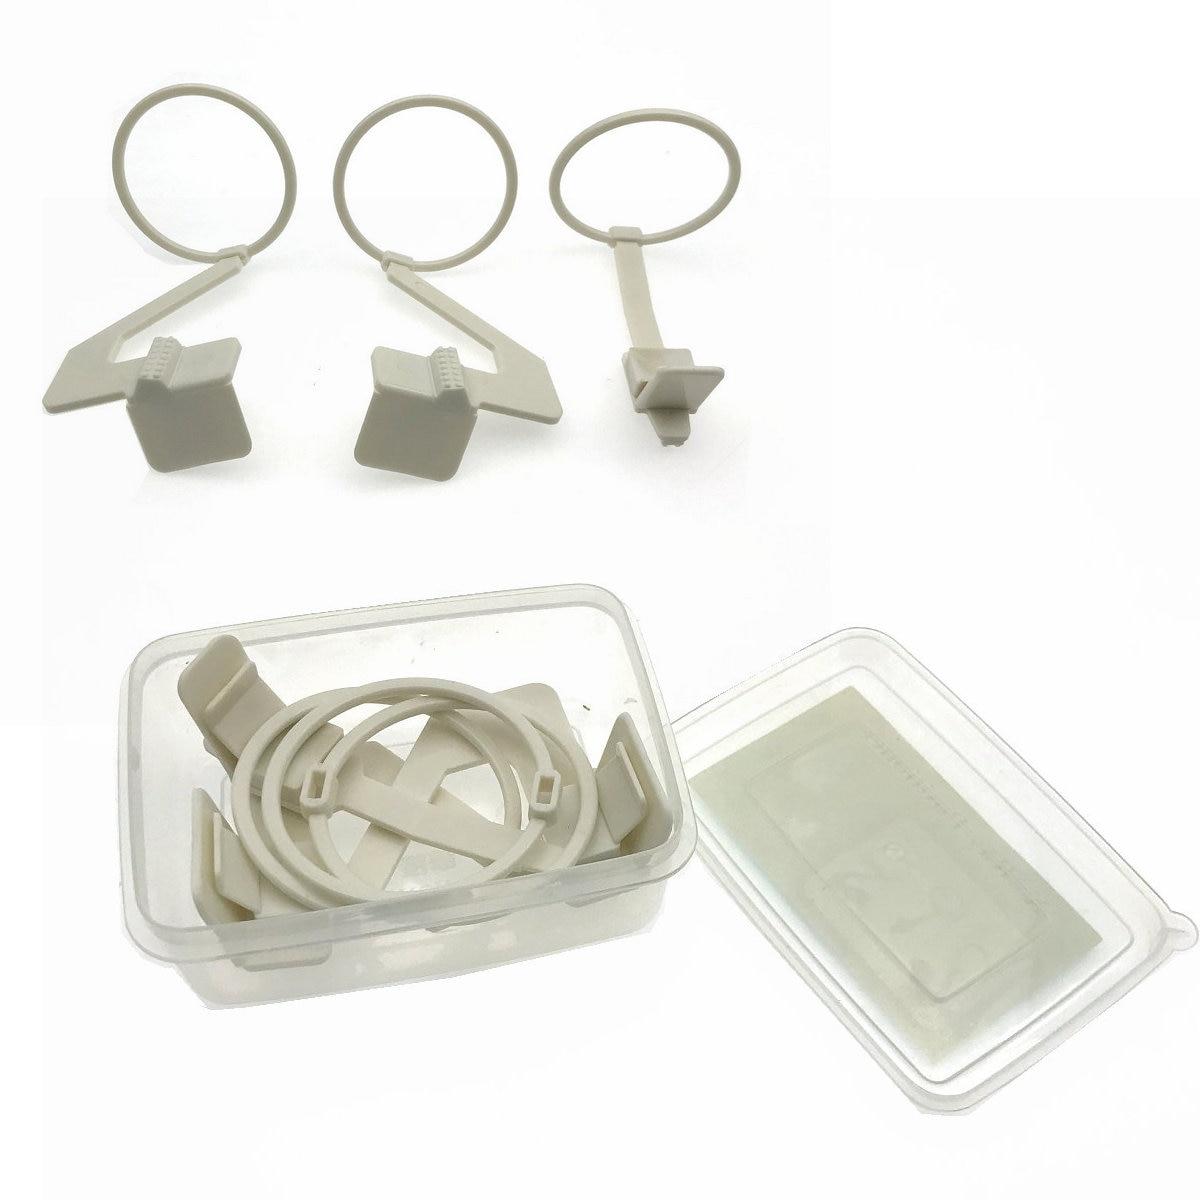 1 Set Dental X-ray Film Positioning System Sensor Positioner Holder Locator1 Set Dental X-ray Film Positioning System Sensor Positioner Holder Locator